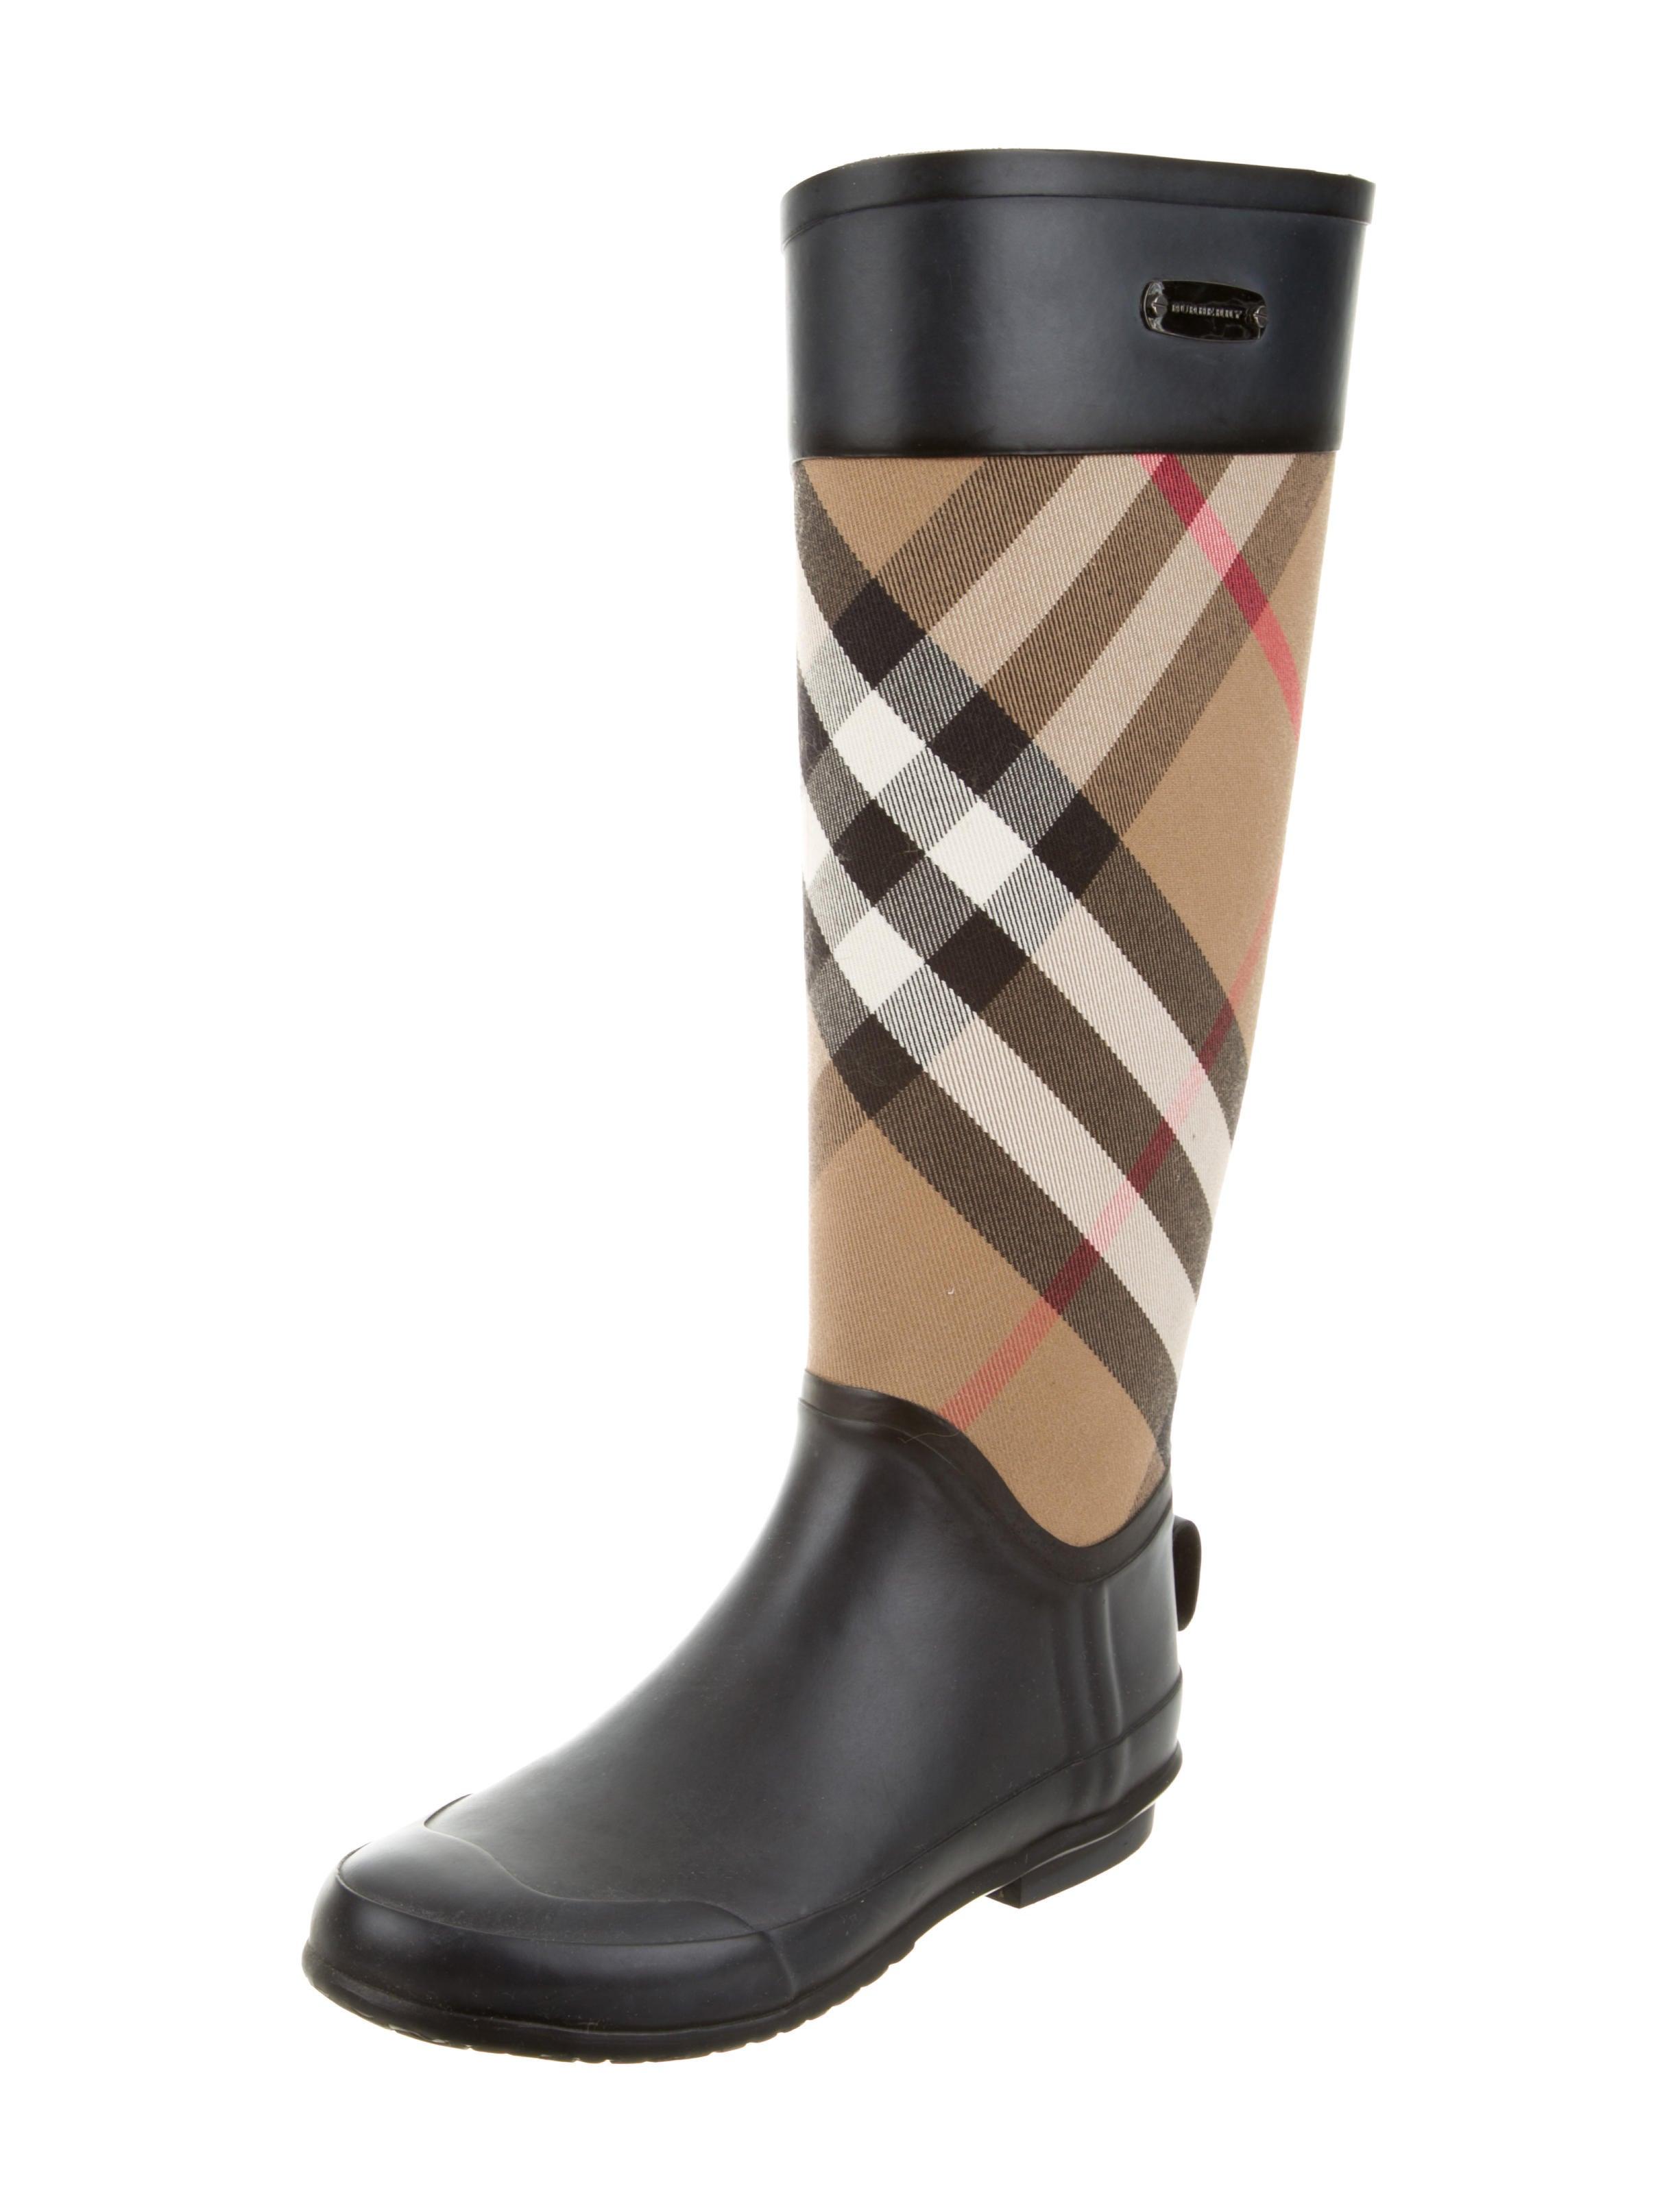 Burberry House Check Rain Boots - Shoes